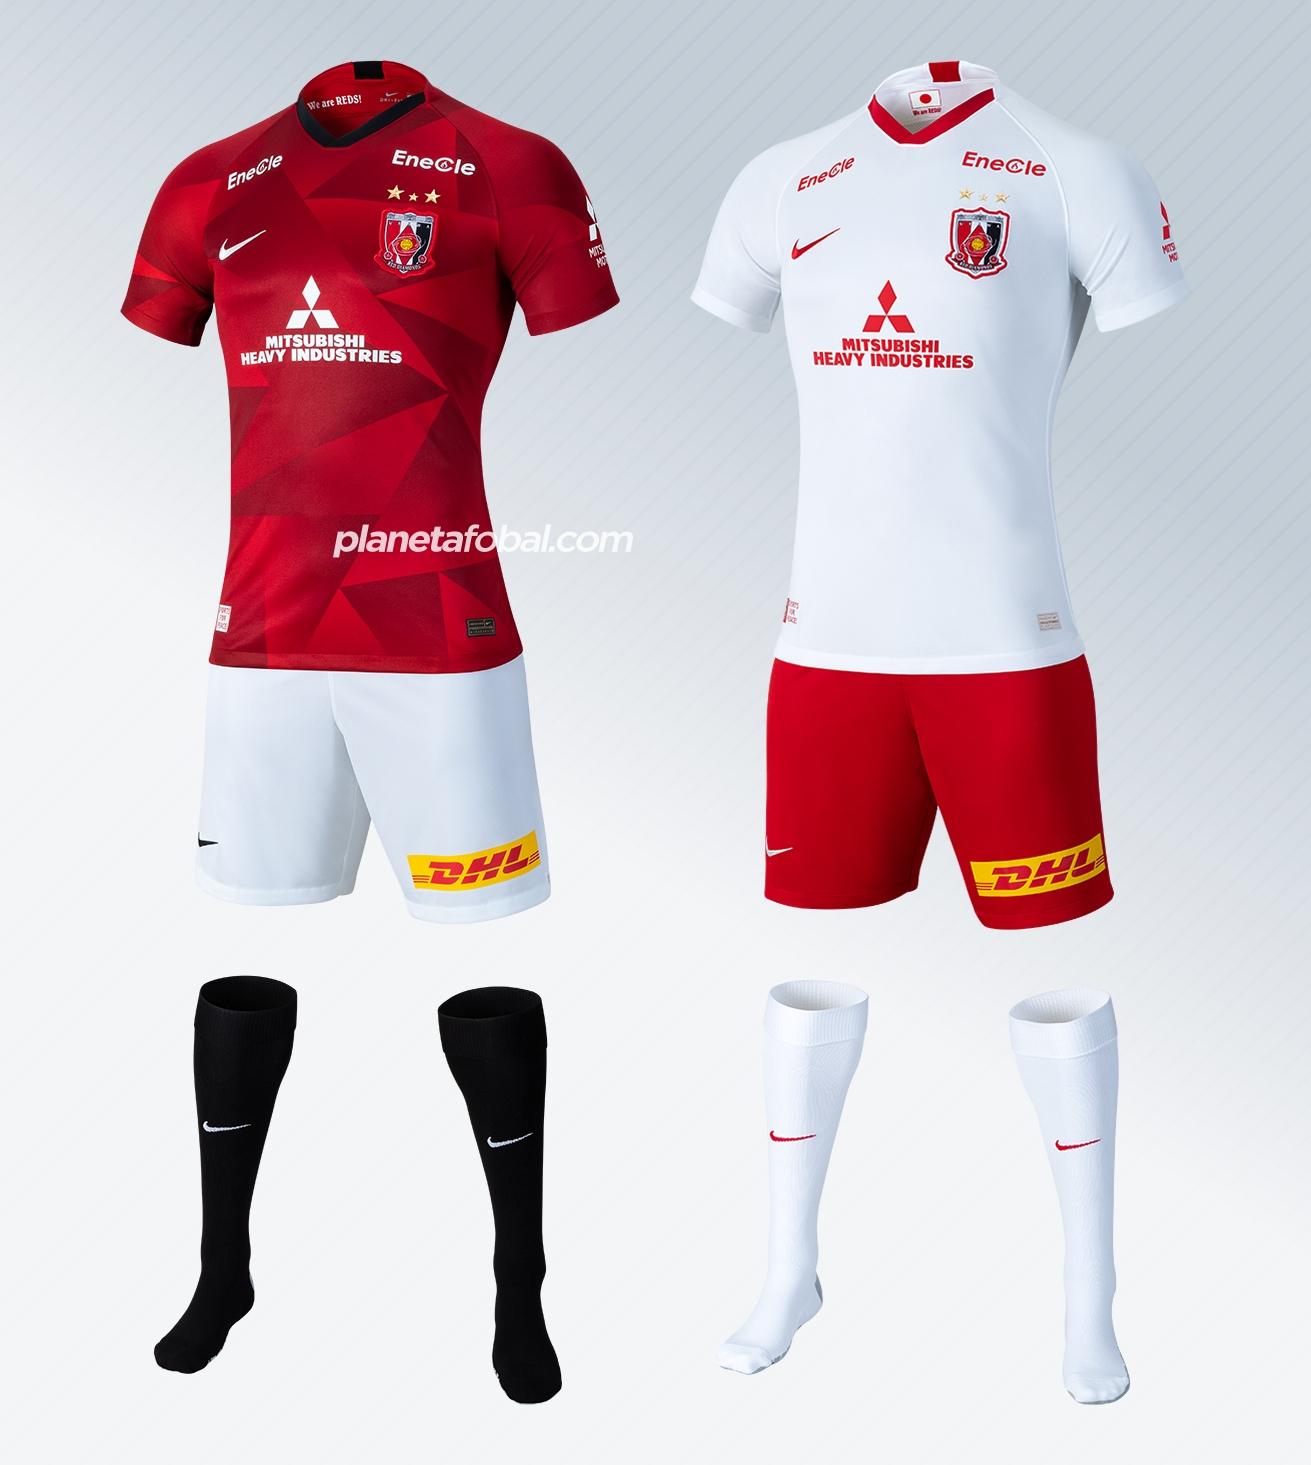 Camisetas 2020 del Urawa Red Diamonds | Imágenes Nike